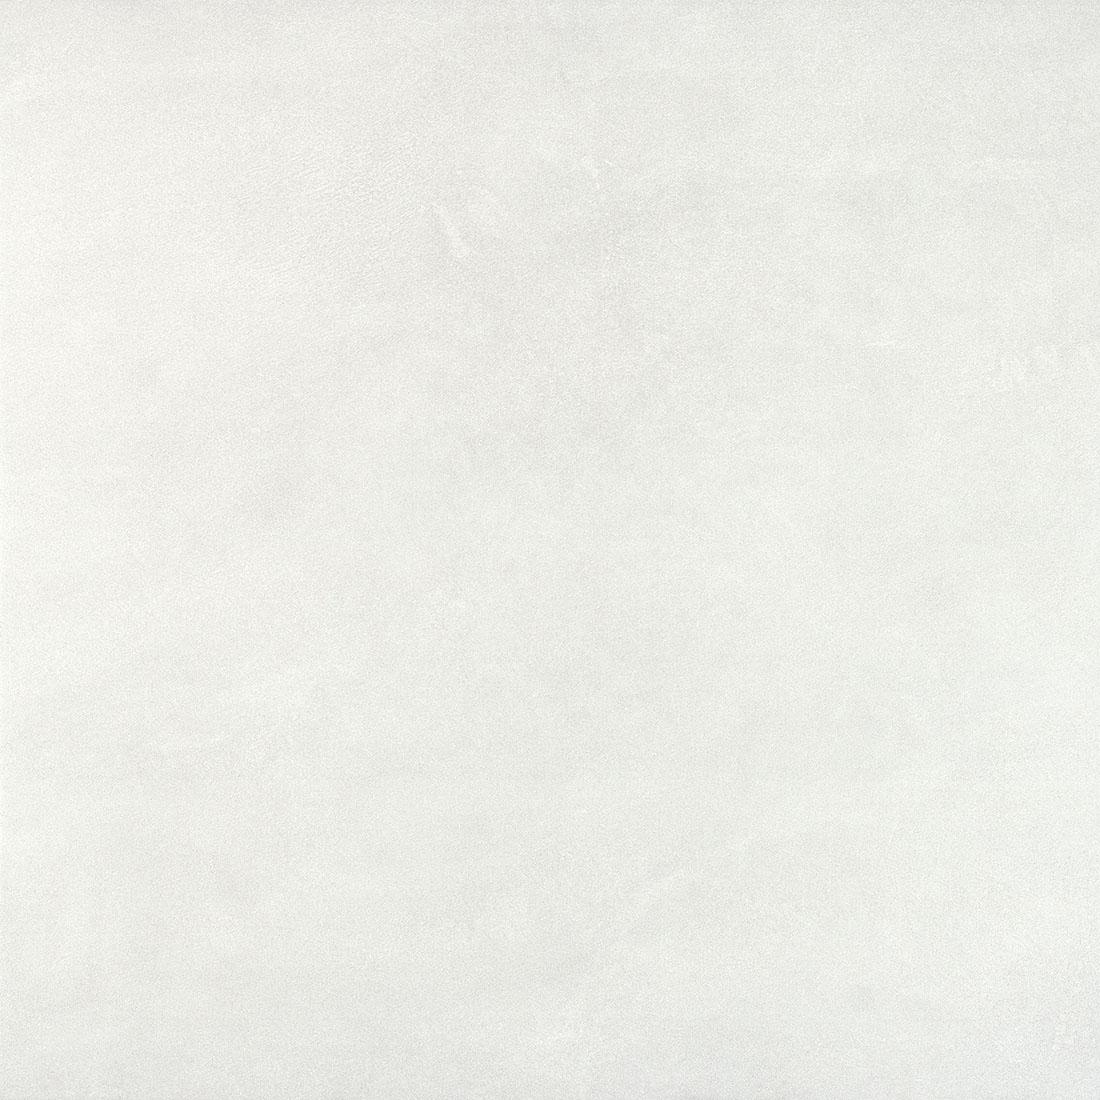 Neutral 60x60 Blanco Matt